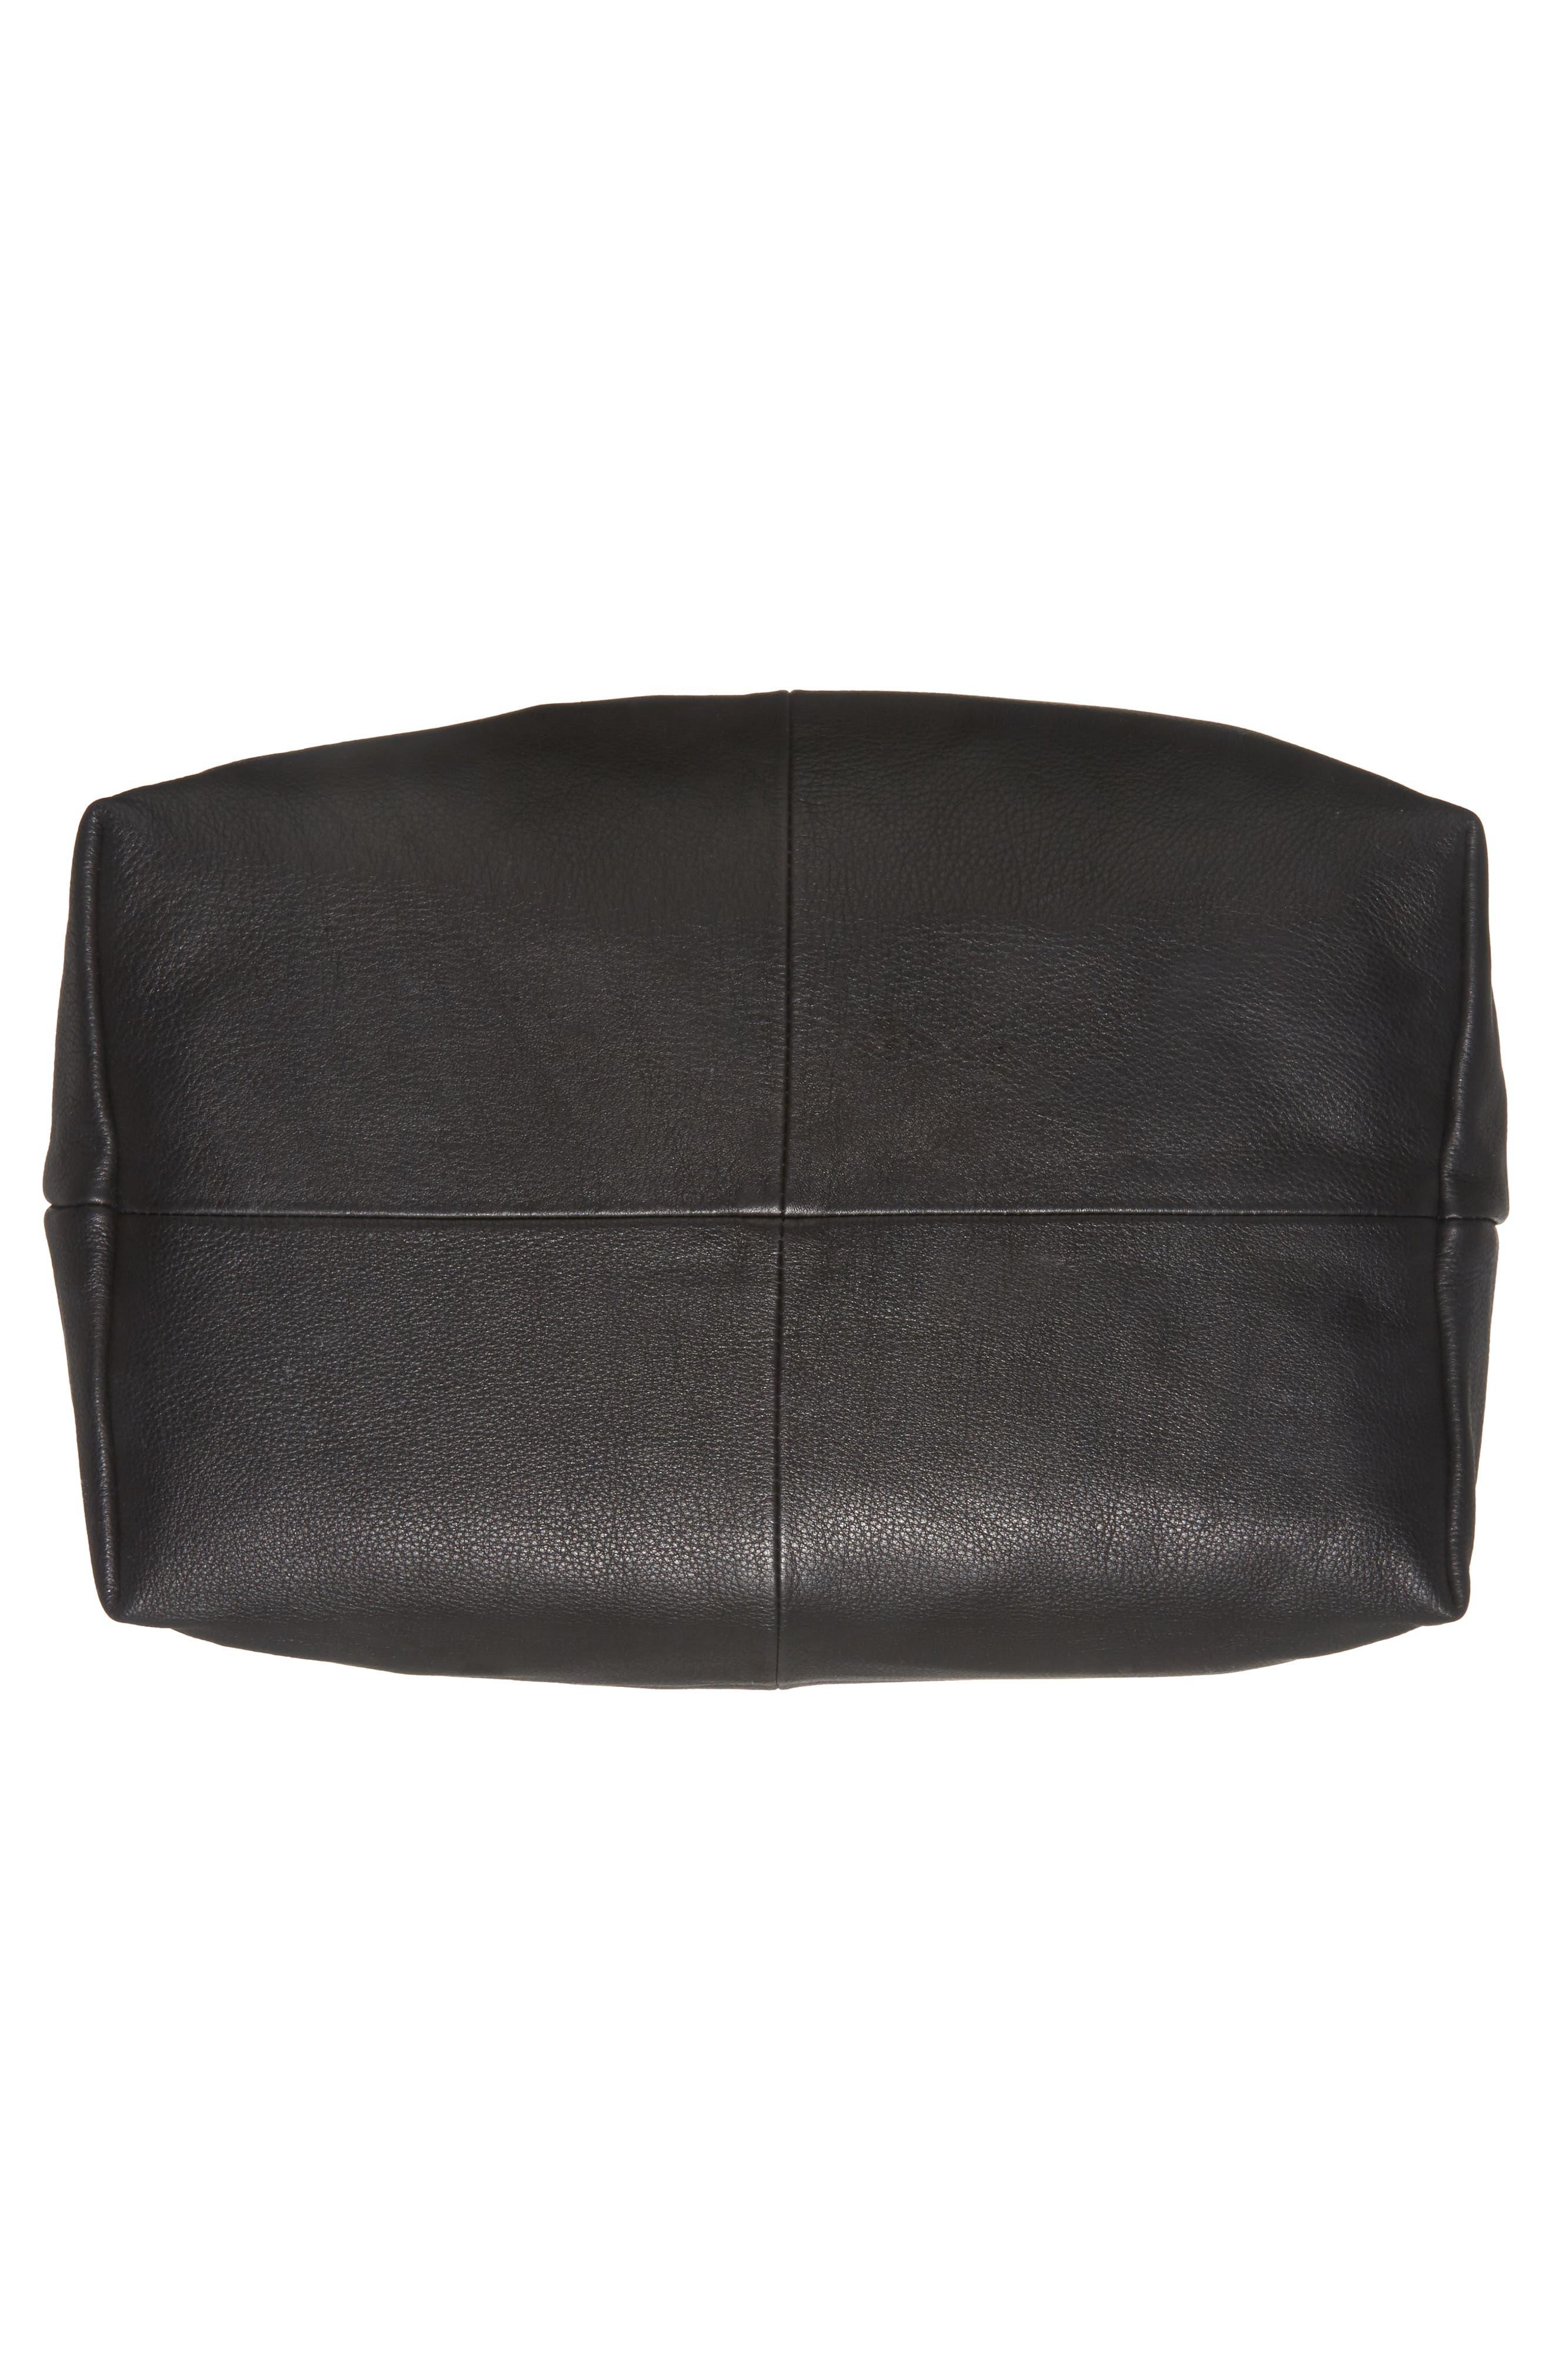 Premium Leather Jasmine Hobo Bag,                             Alternate thumbnail 6, color,                             001